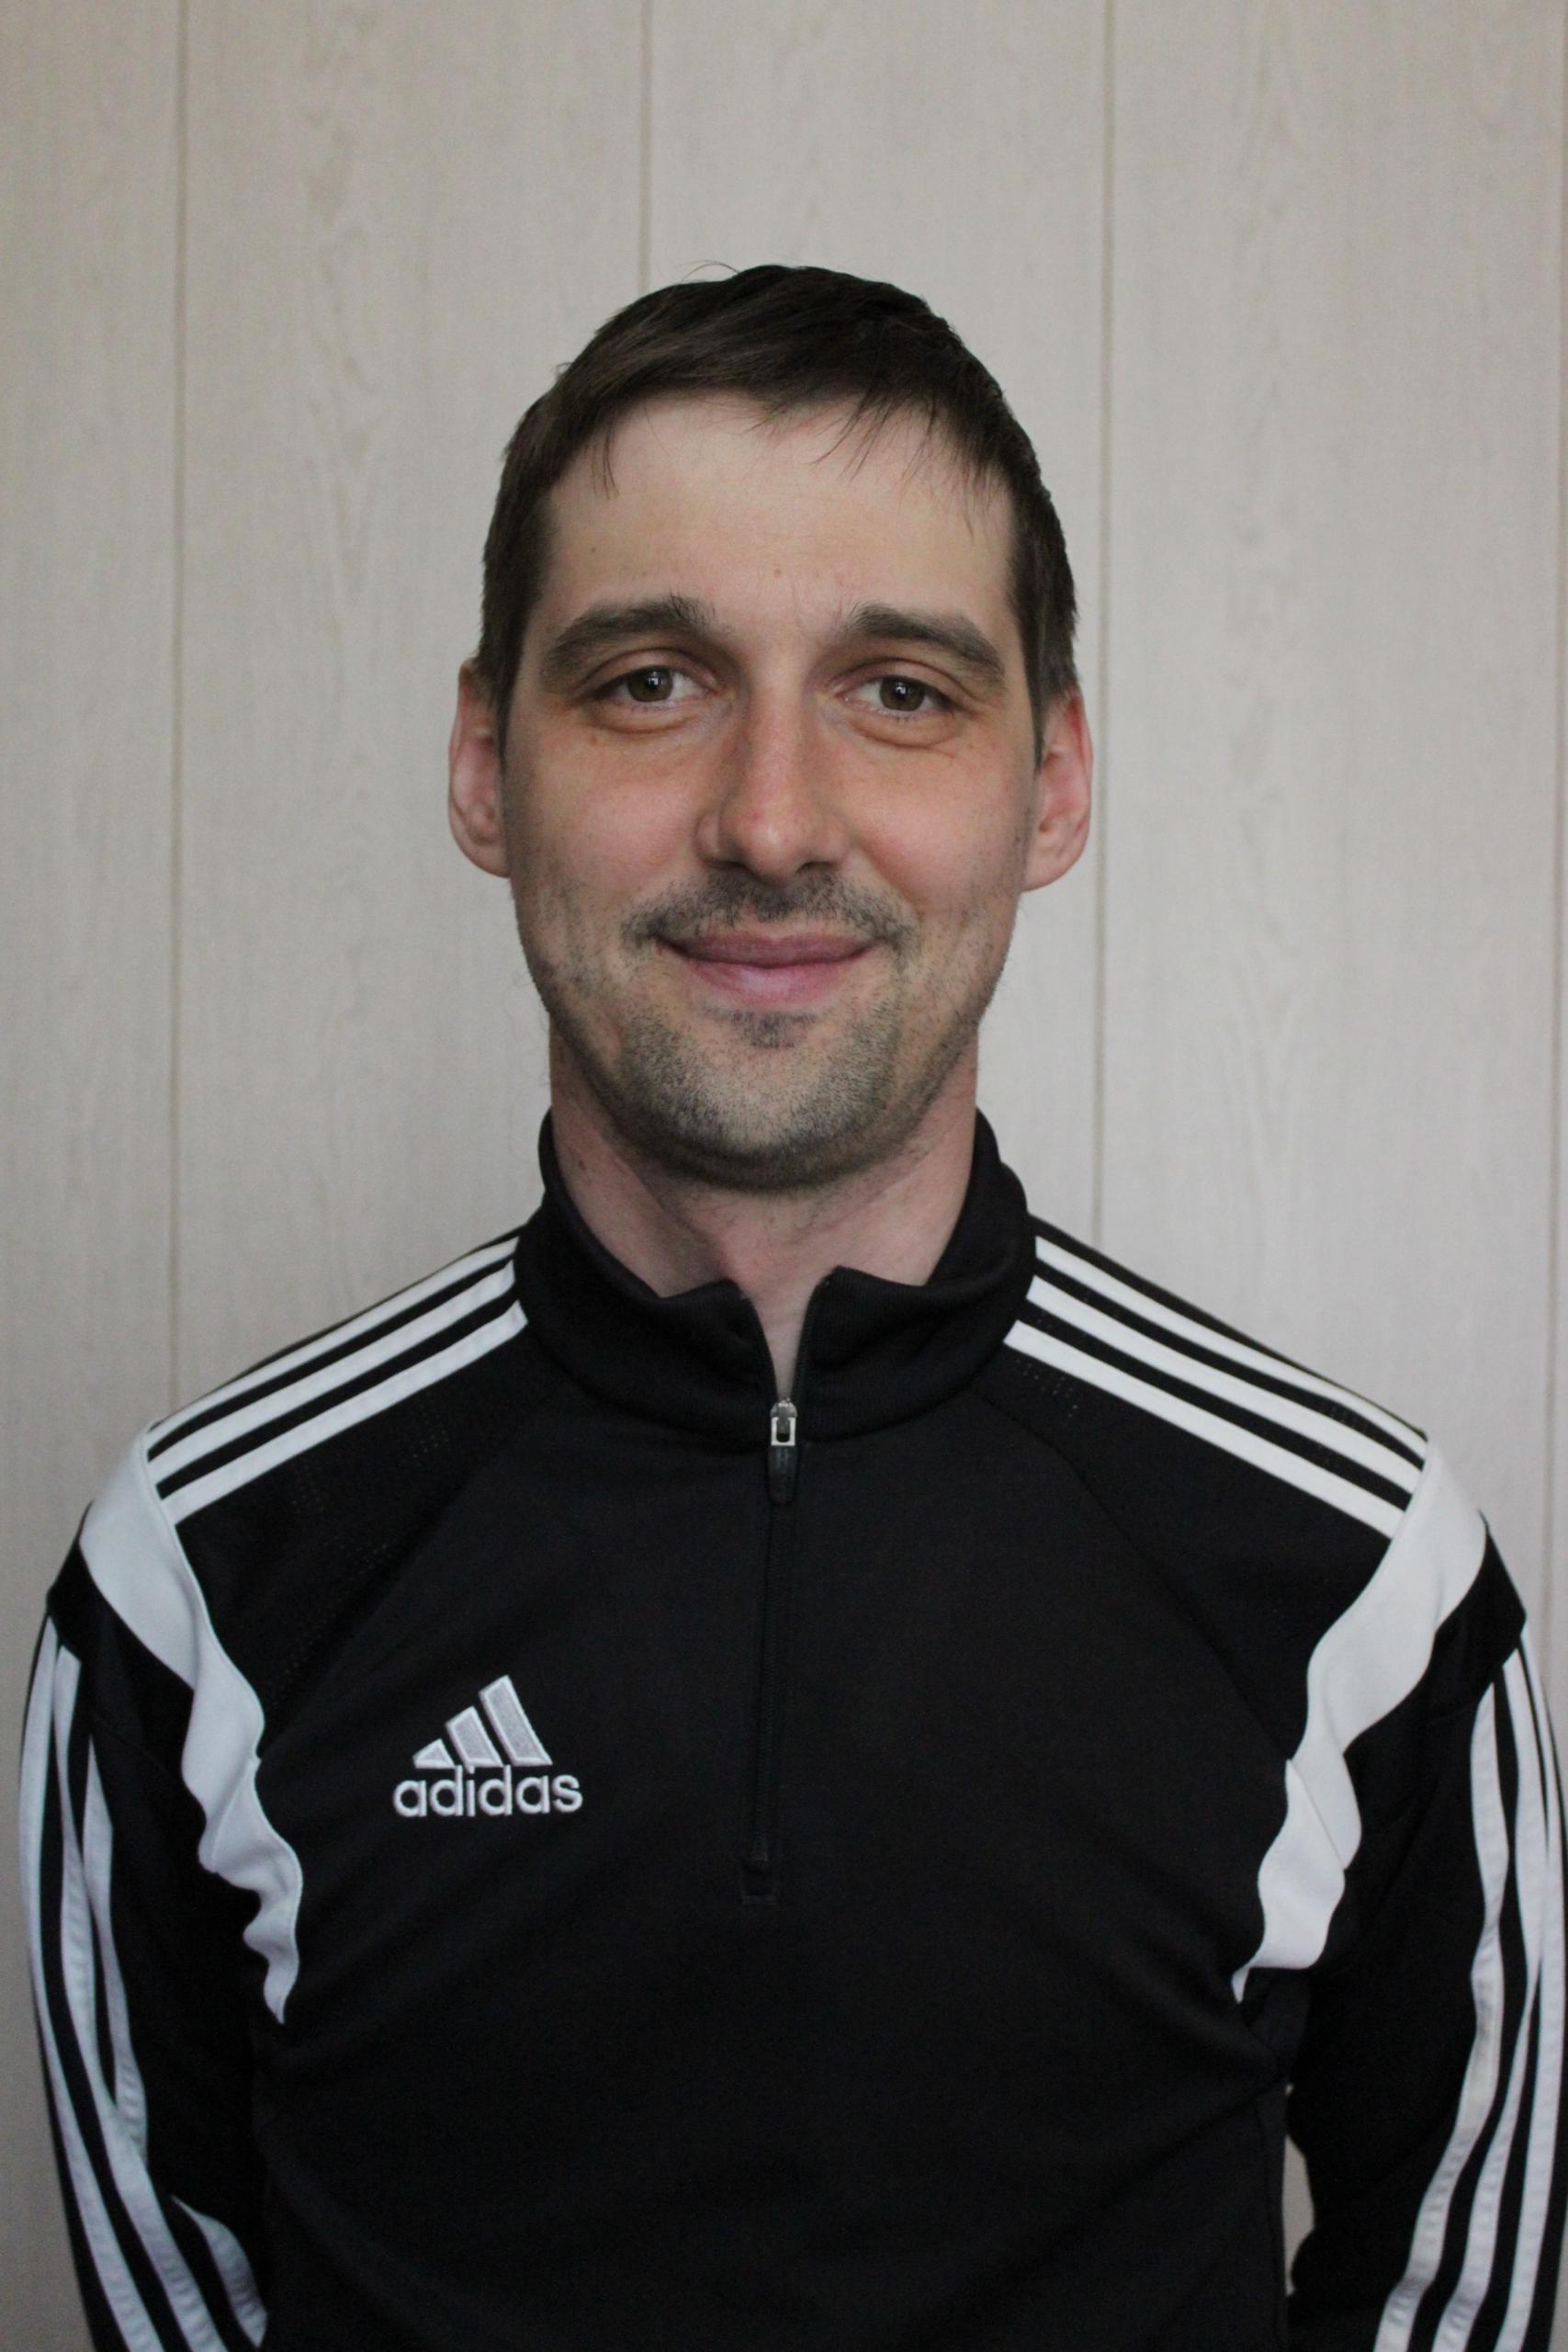 Иванов Александр Анатольевич